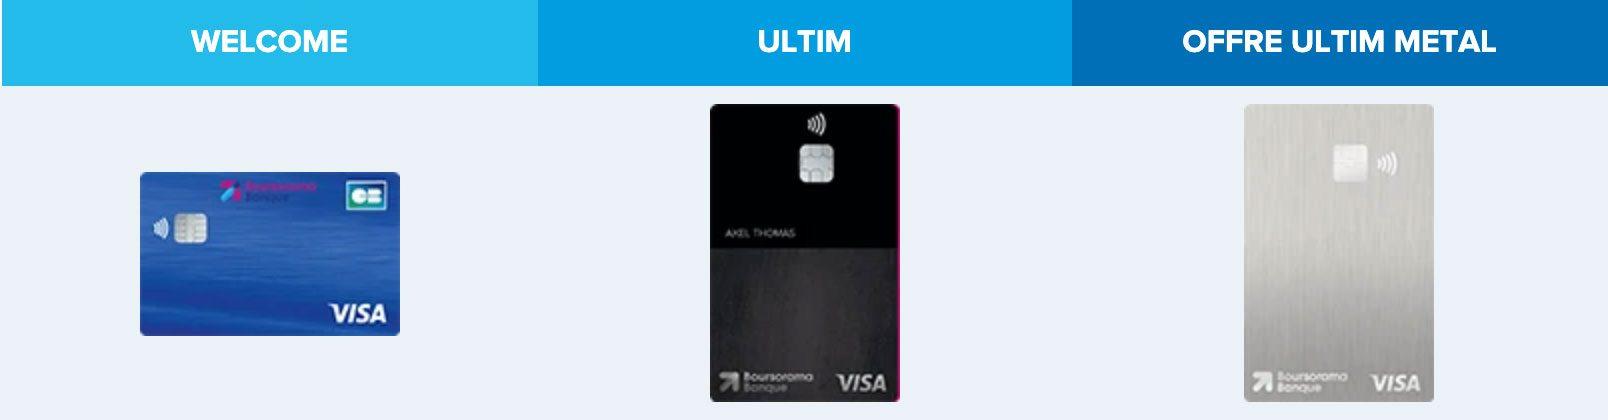 Carte bancaire Boursorama Banque